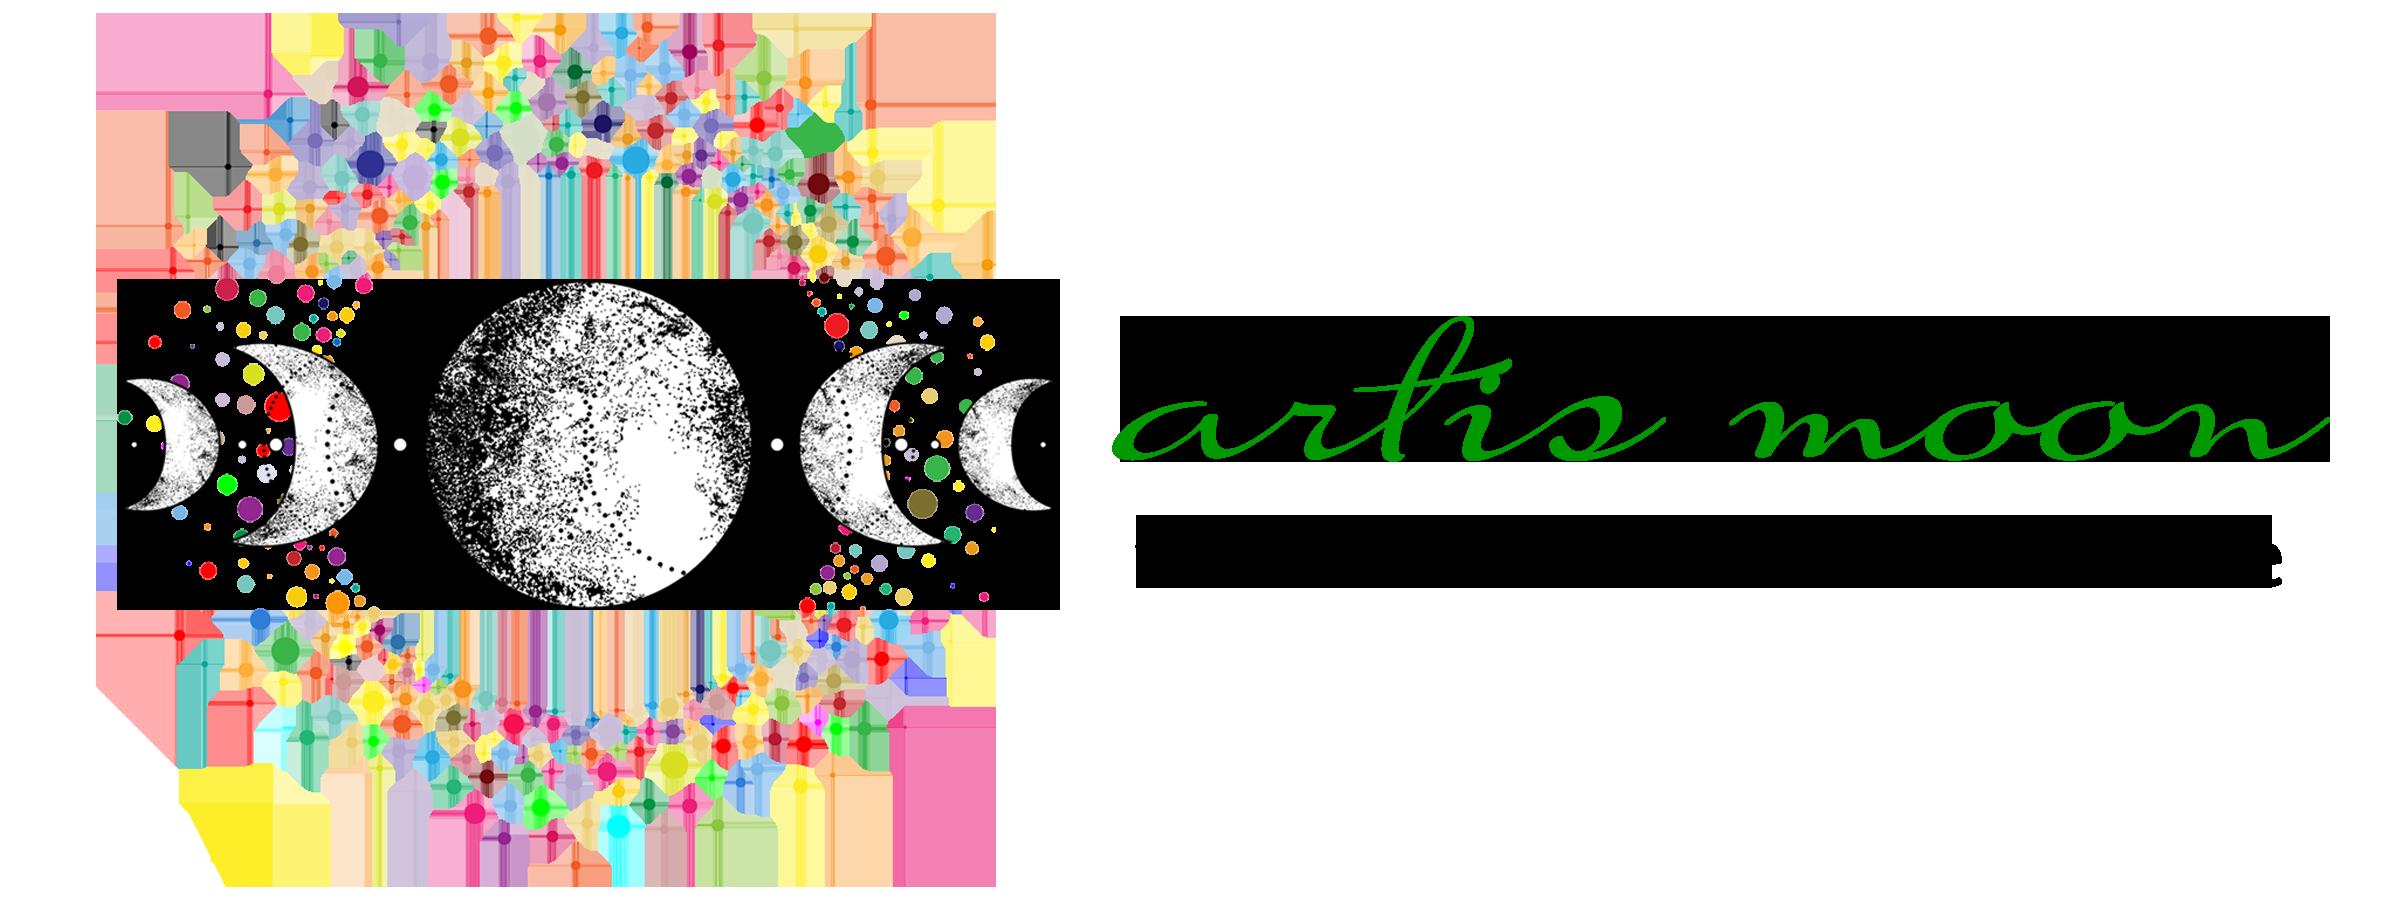 artis moon | beBoundless.us